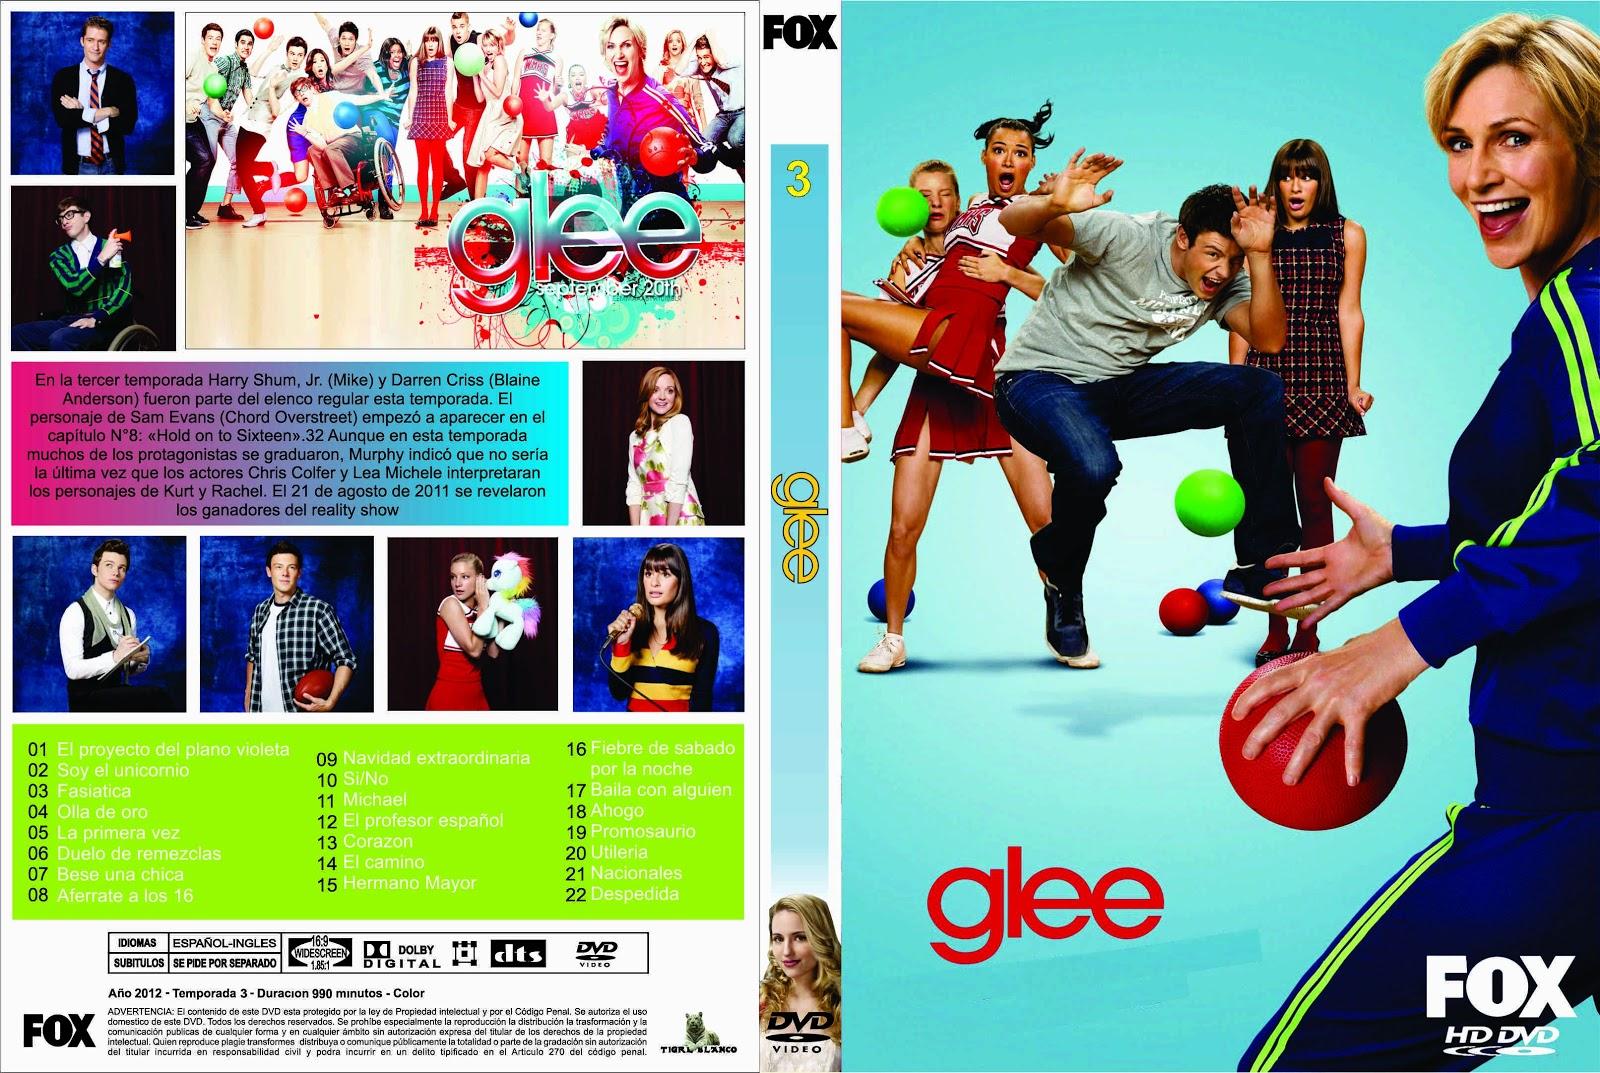 http://4.bp.blogspot.com/-Px36dSo__sA/ULvKRw5LBuI/AAAAAAAAEB0/e8G3jBJHE7E/s1600/Glee+Temporada+03+Custom+V2.jpg